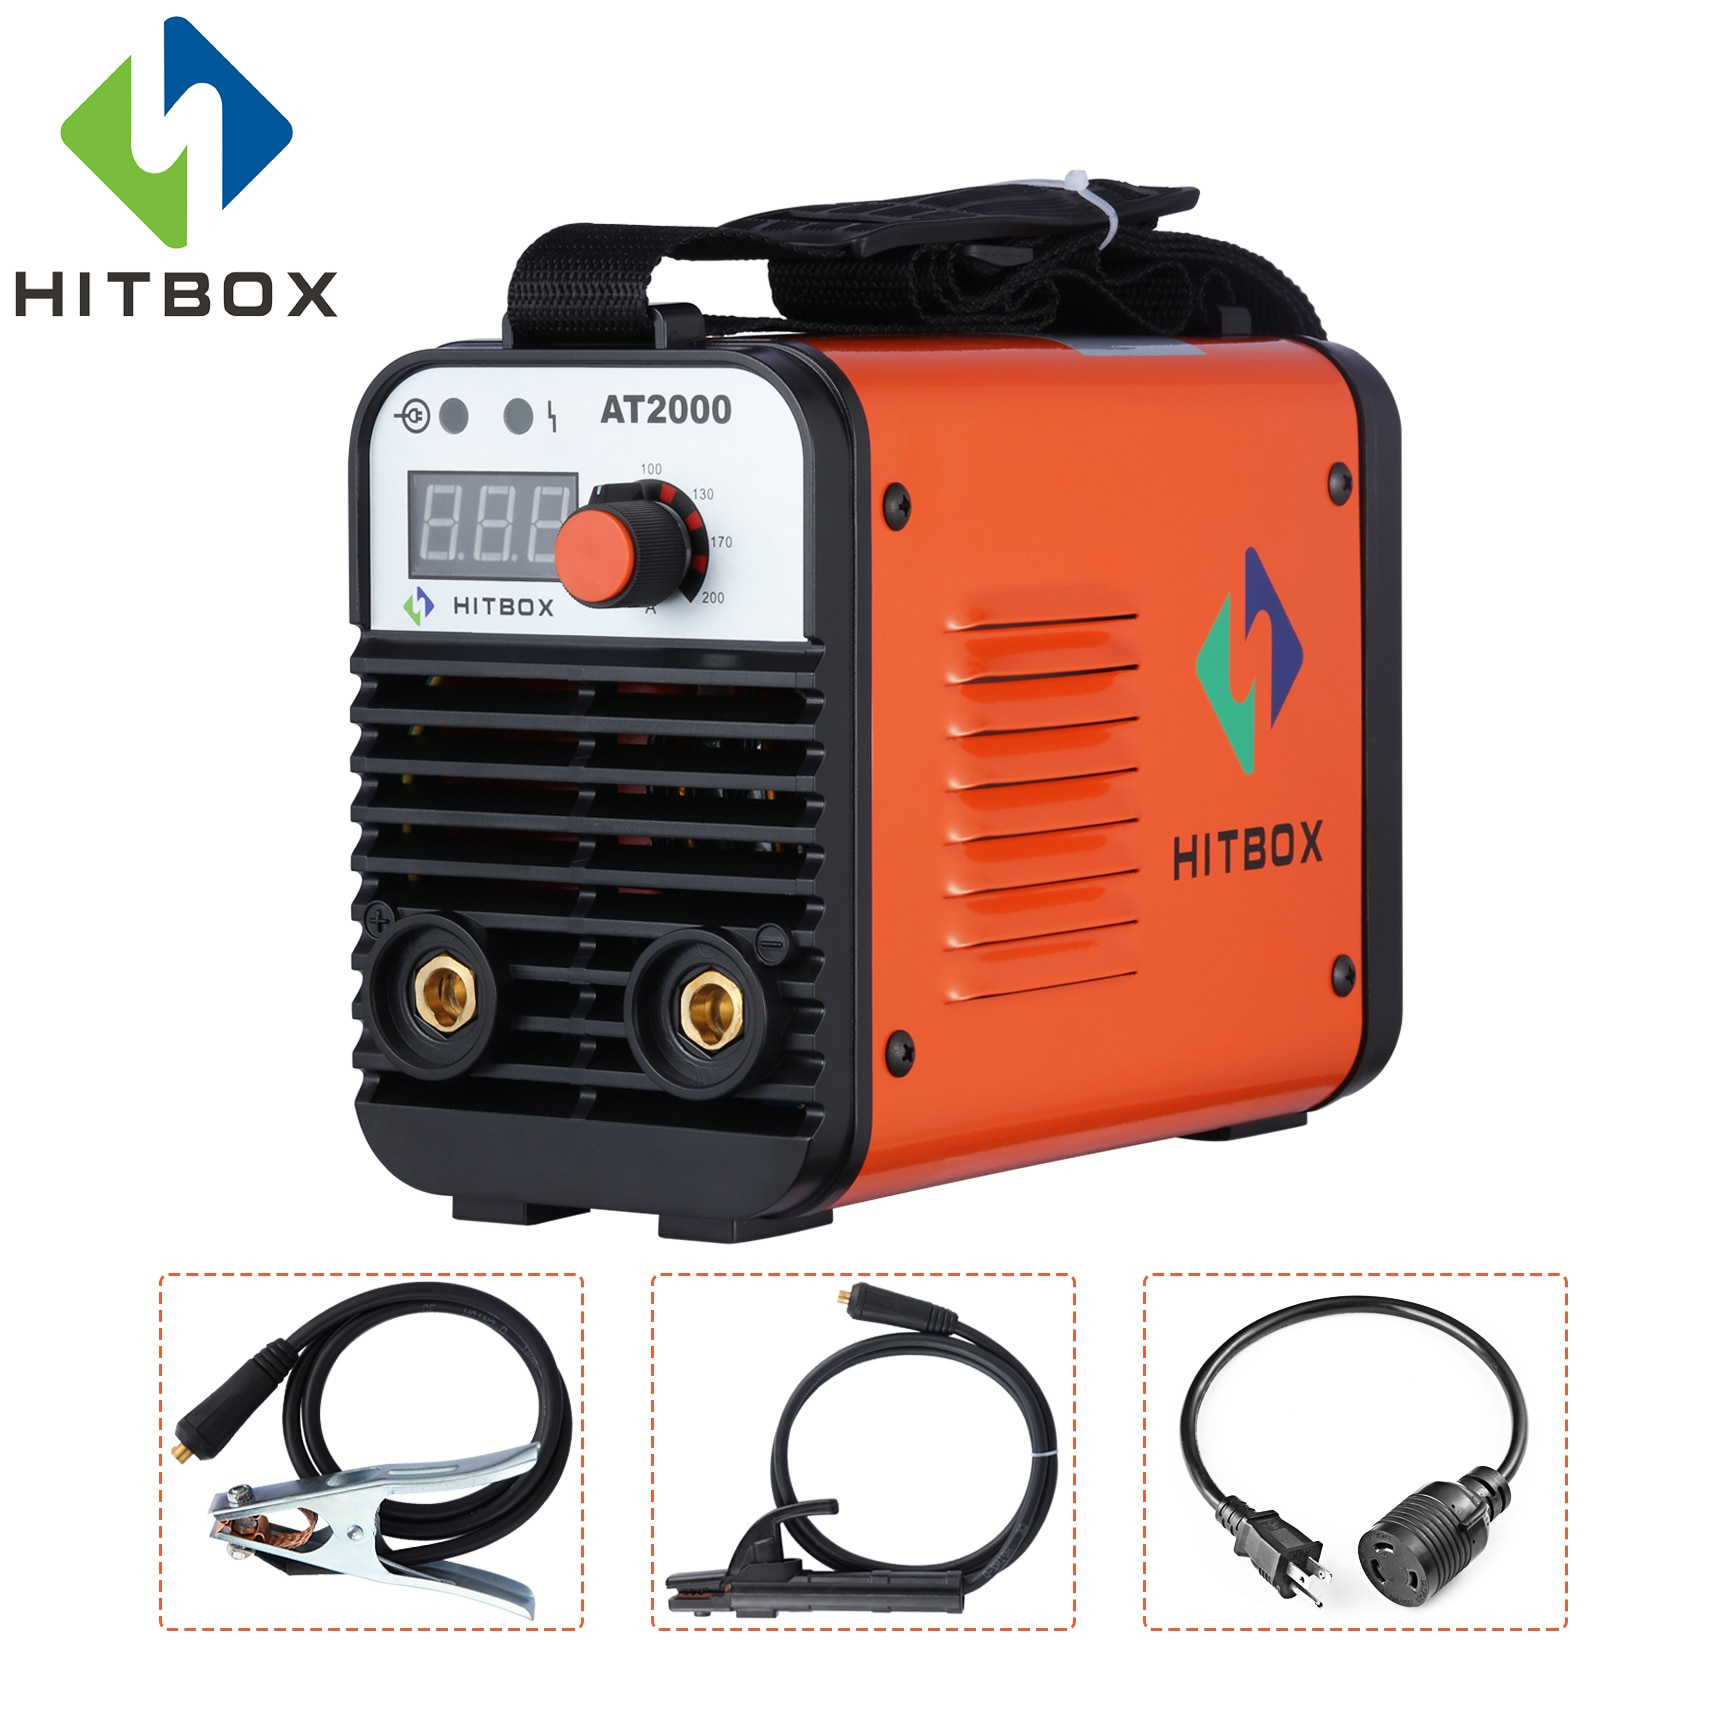 Hitbox 110 v 220 v arco soldador mma máquina de solda at2000 inversor soldadores a arco dupla tensão igbt tecnologia nova chegada mini soldador